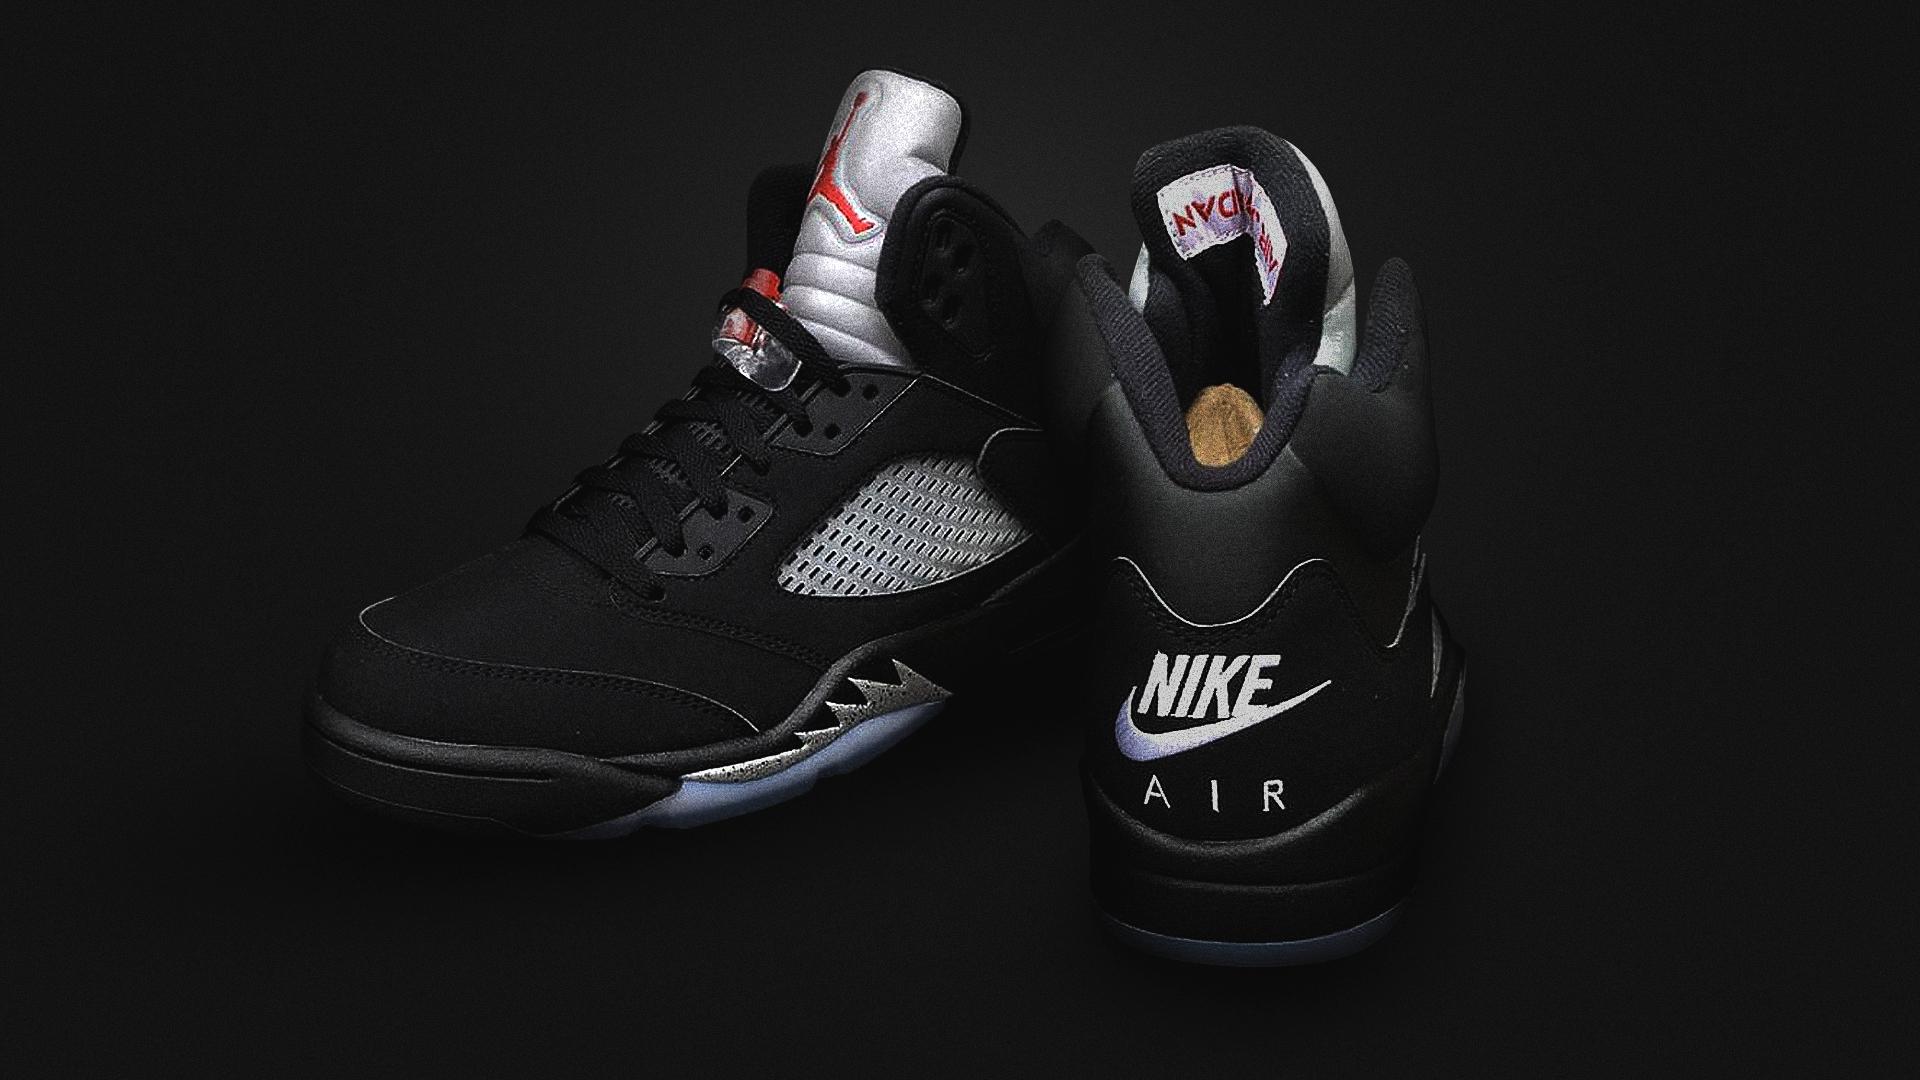 Nike 3d Wallpaper Download Free Air Jordan Shoes Wallpapers Pixelstalk Net